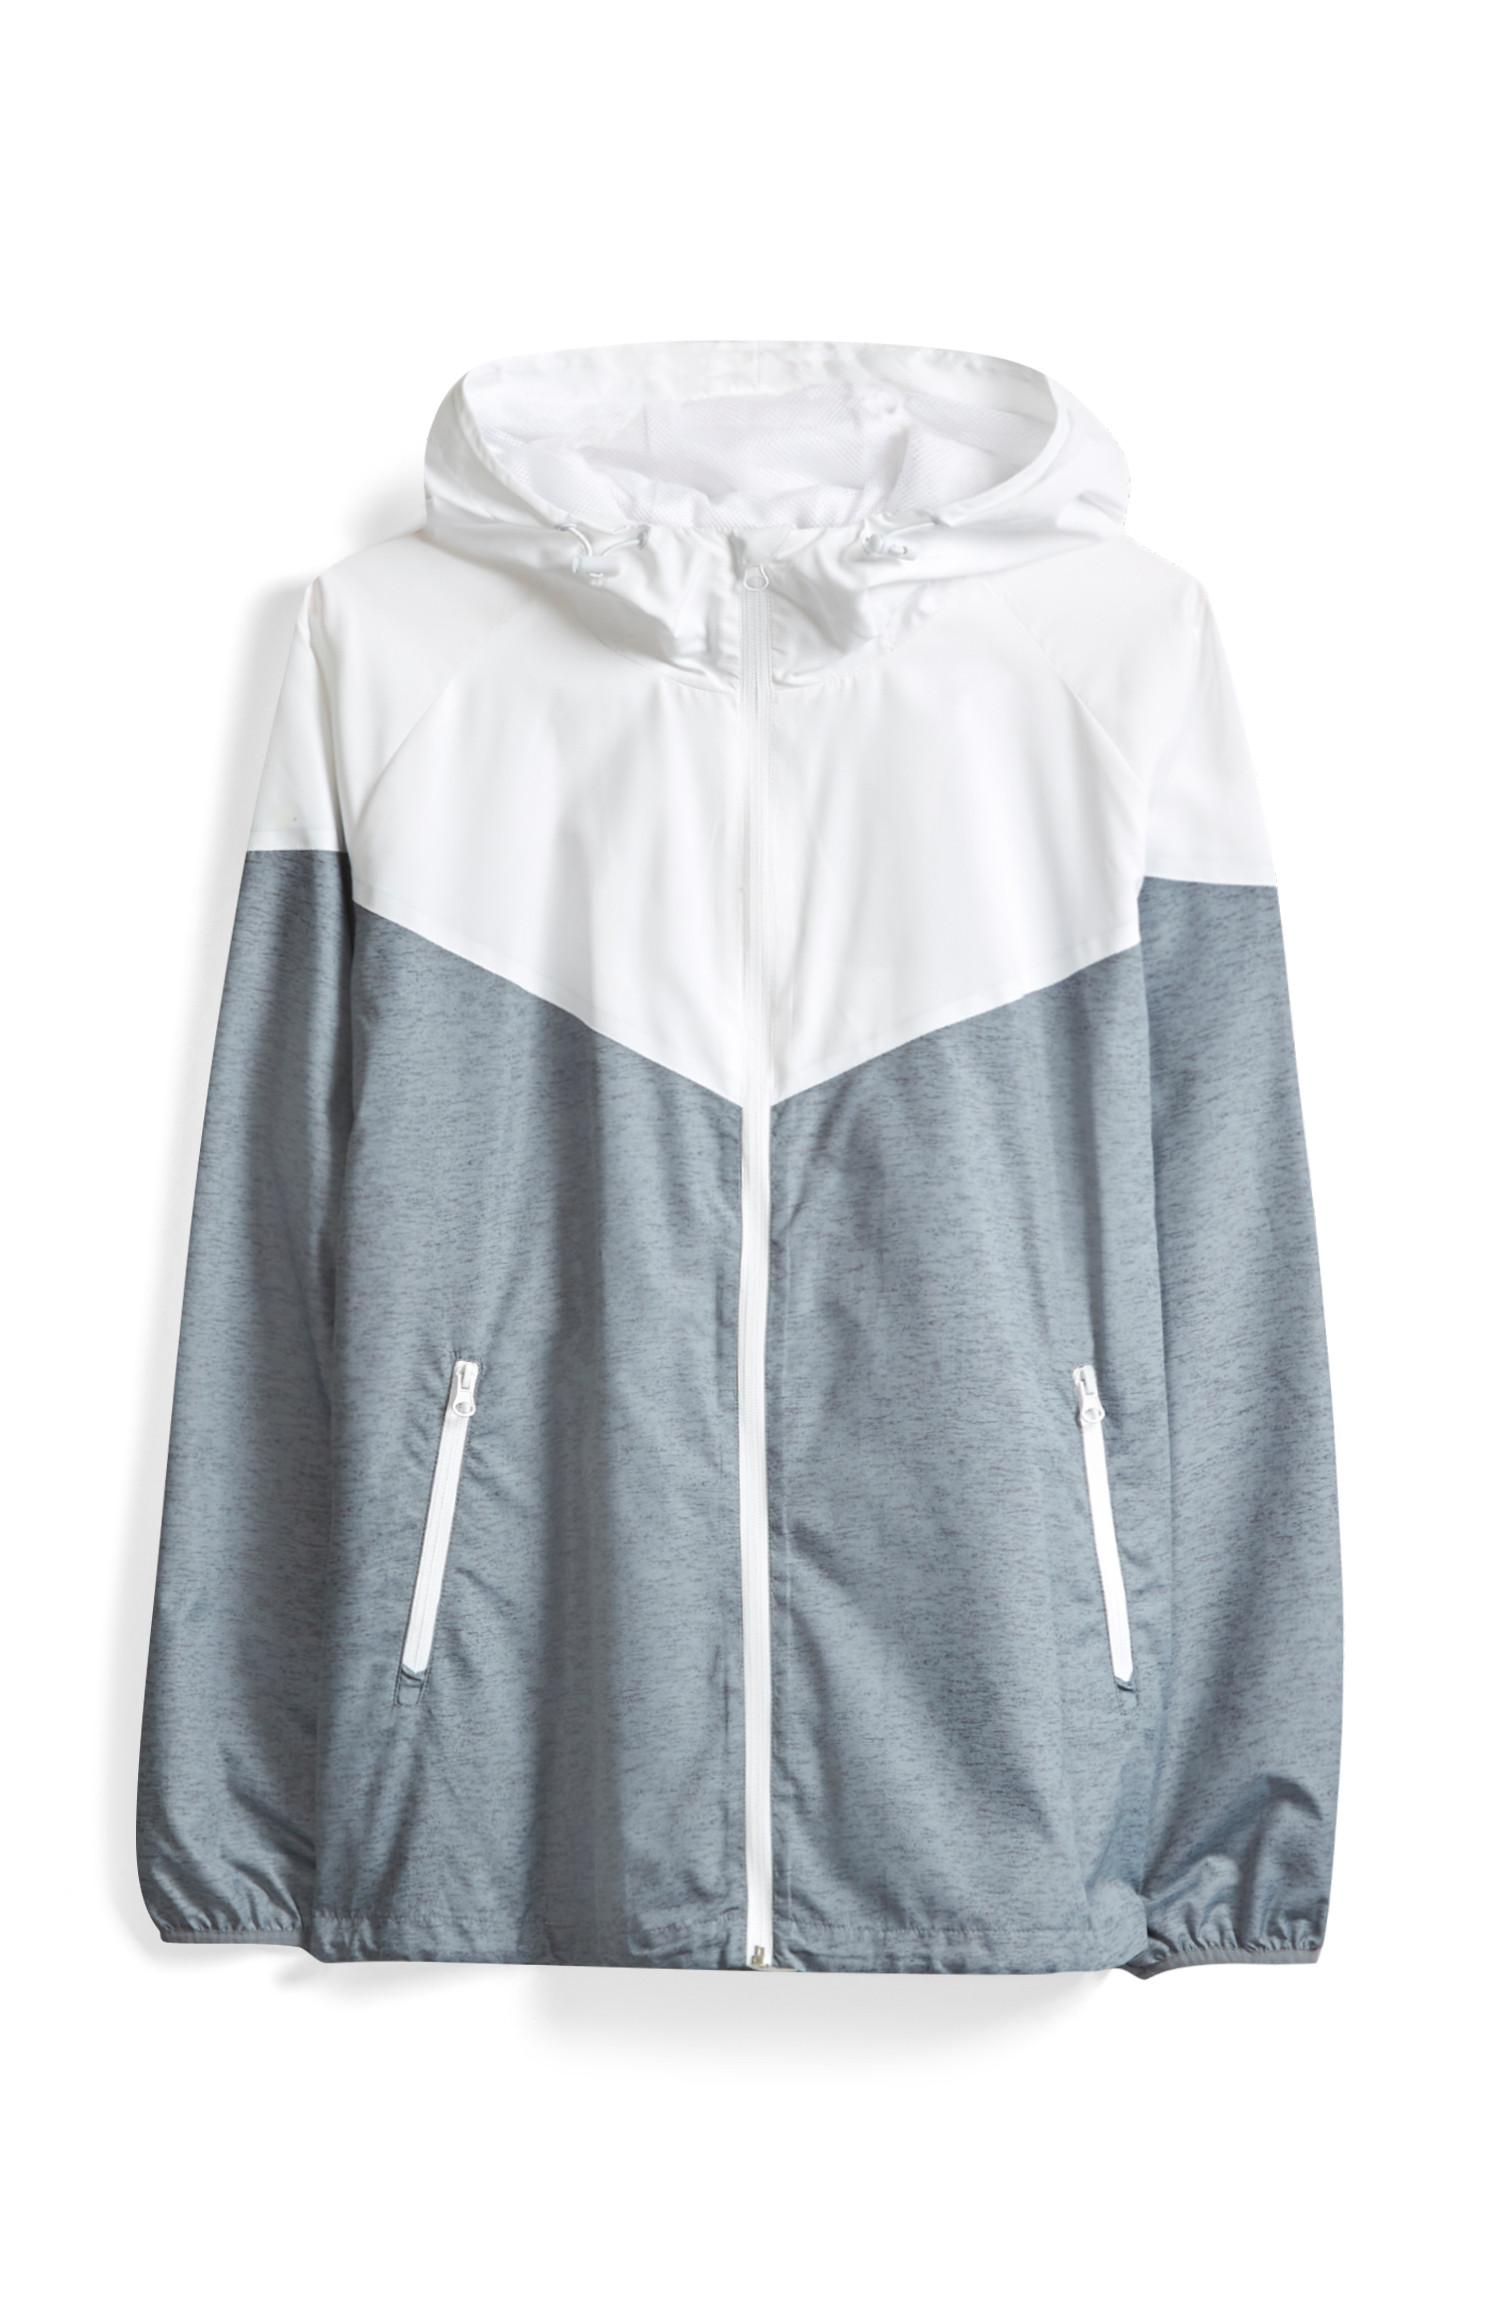 Grey And White Zip Jacket